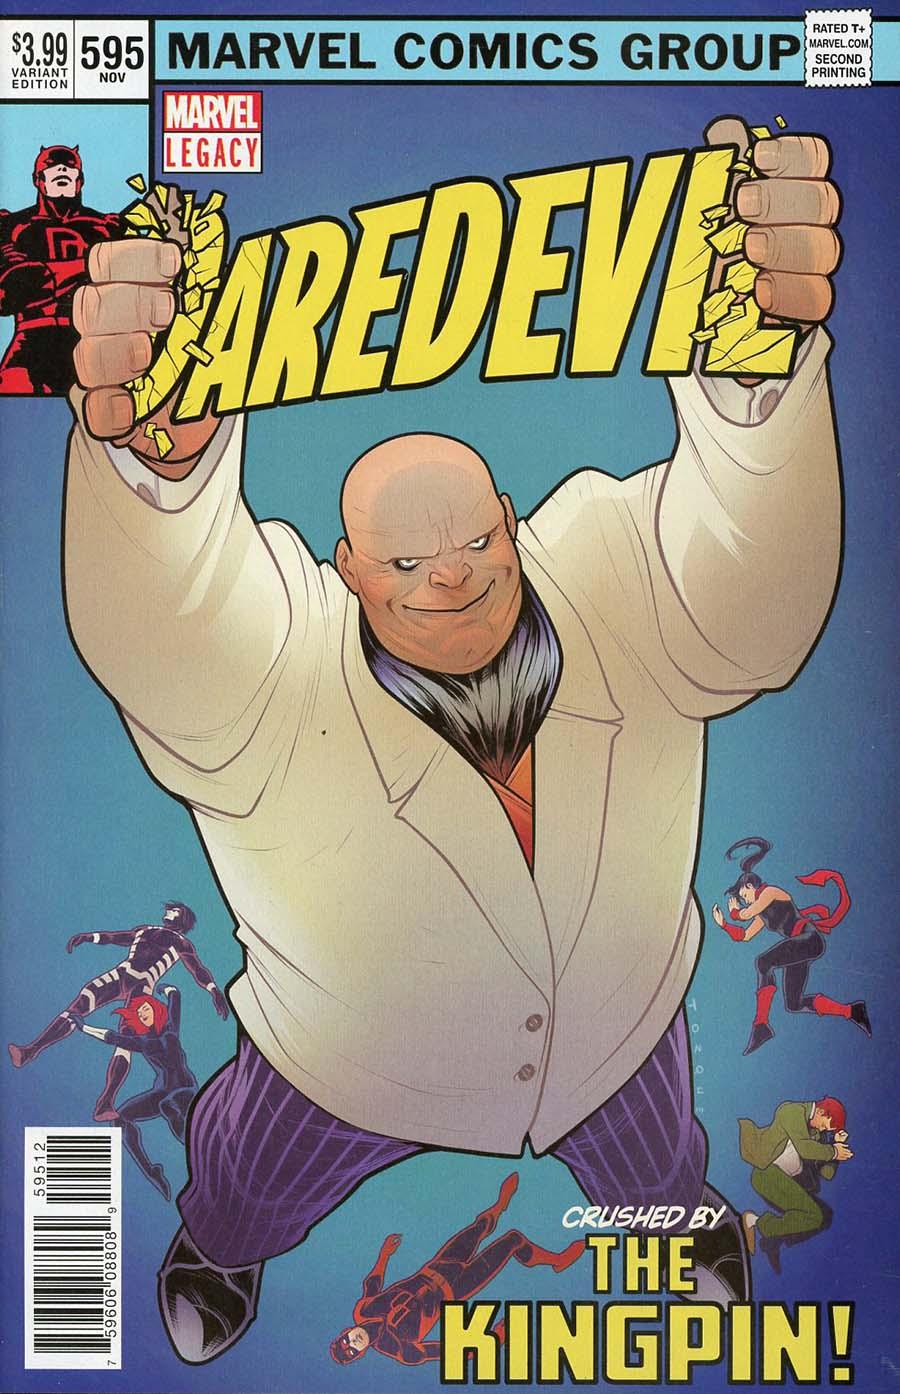 Daredevil Vol 5 #595 Cover H 2nd Ptg Torque Variant Elizabeth Torque Cover (Marvel Legacy Tie-In)